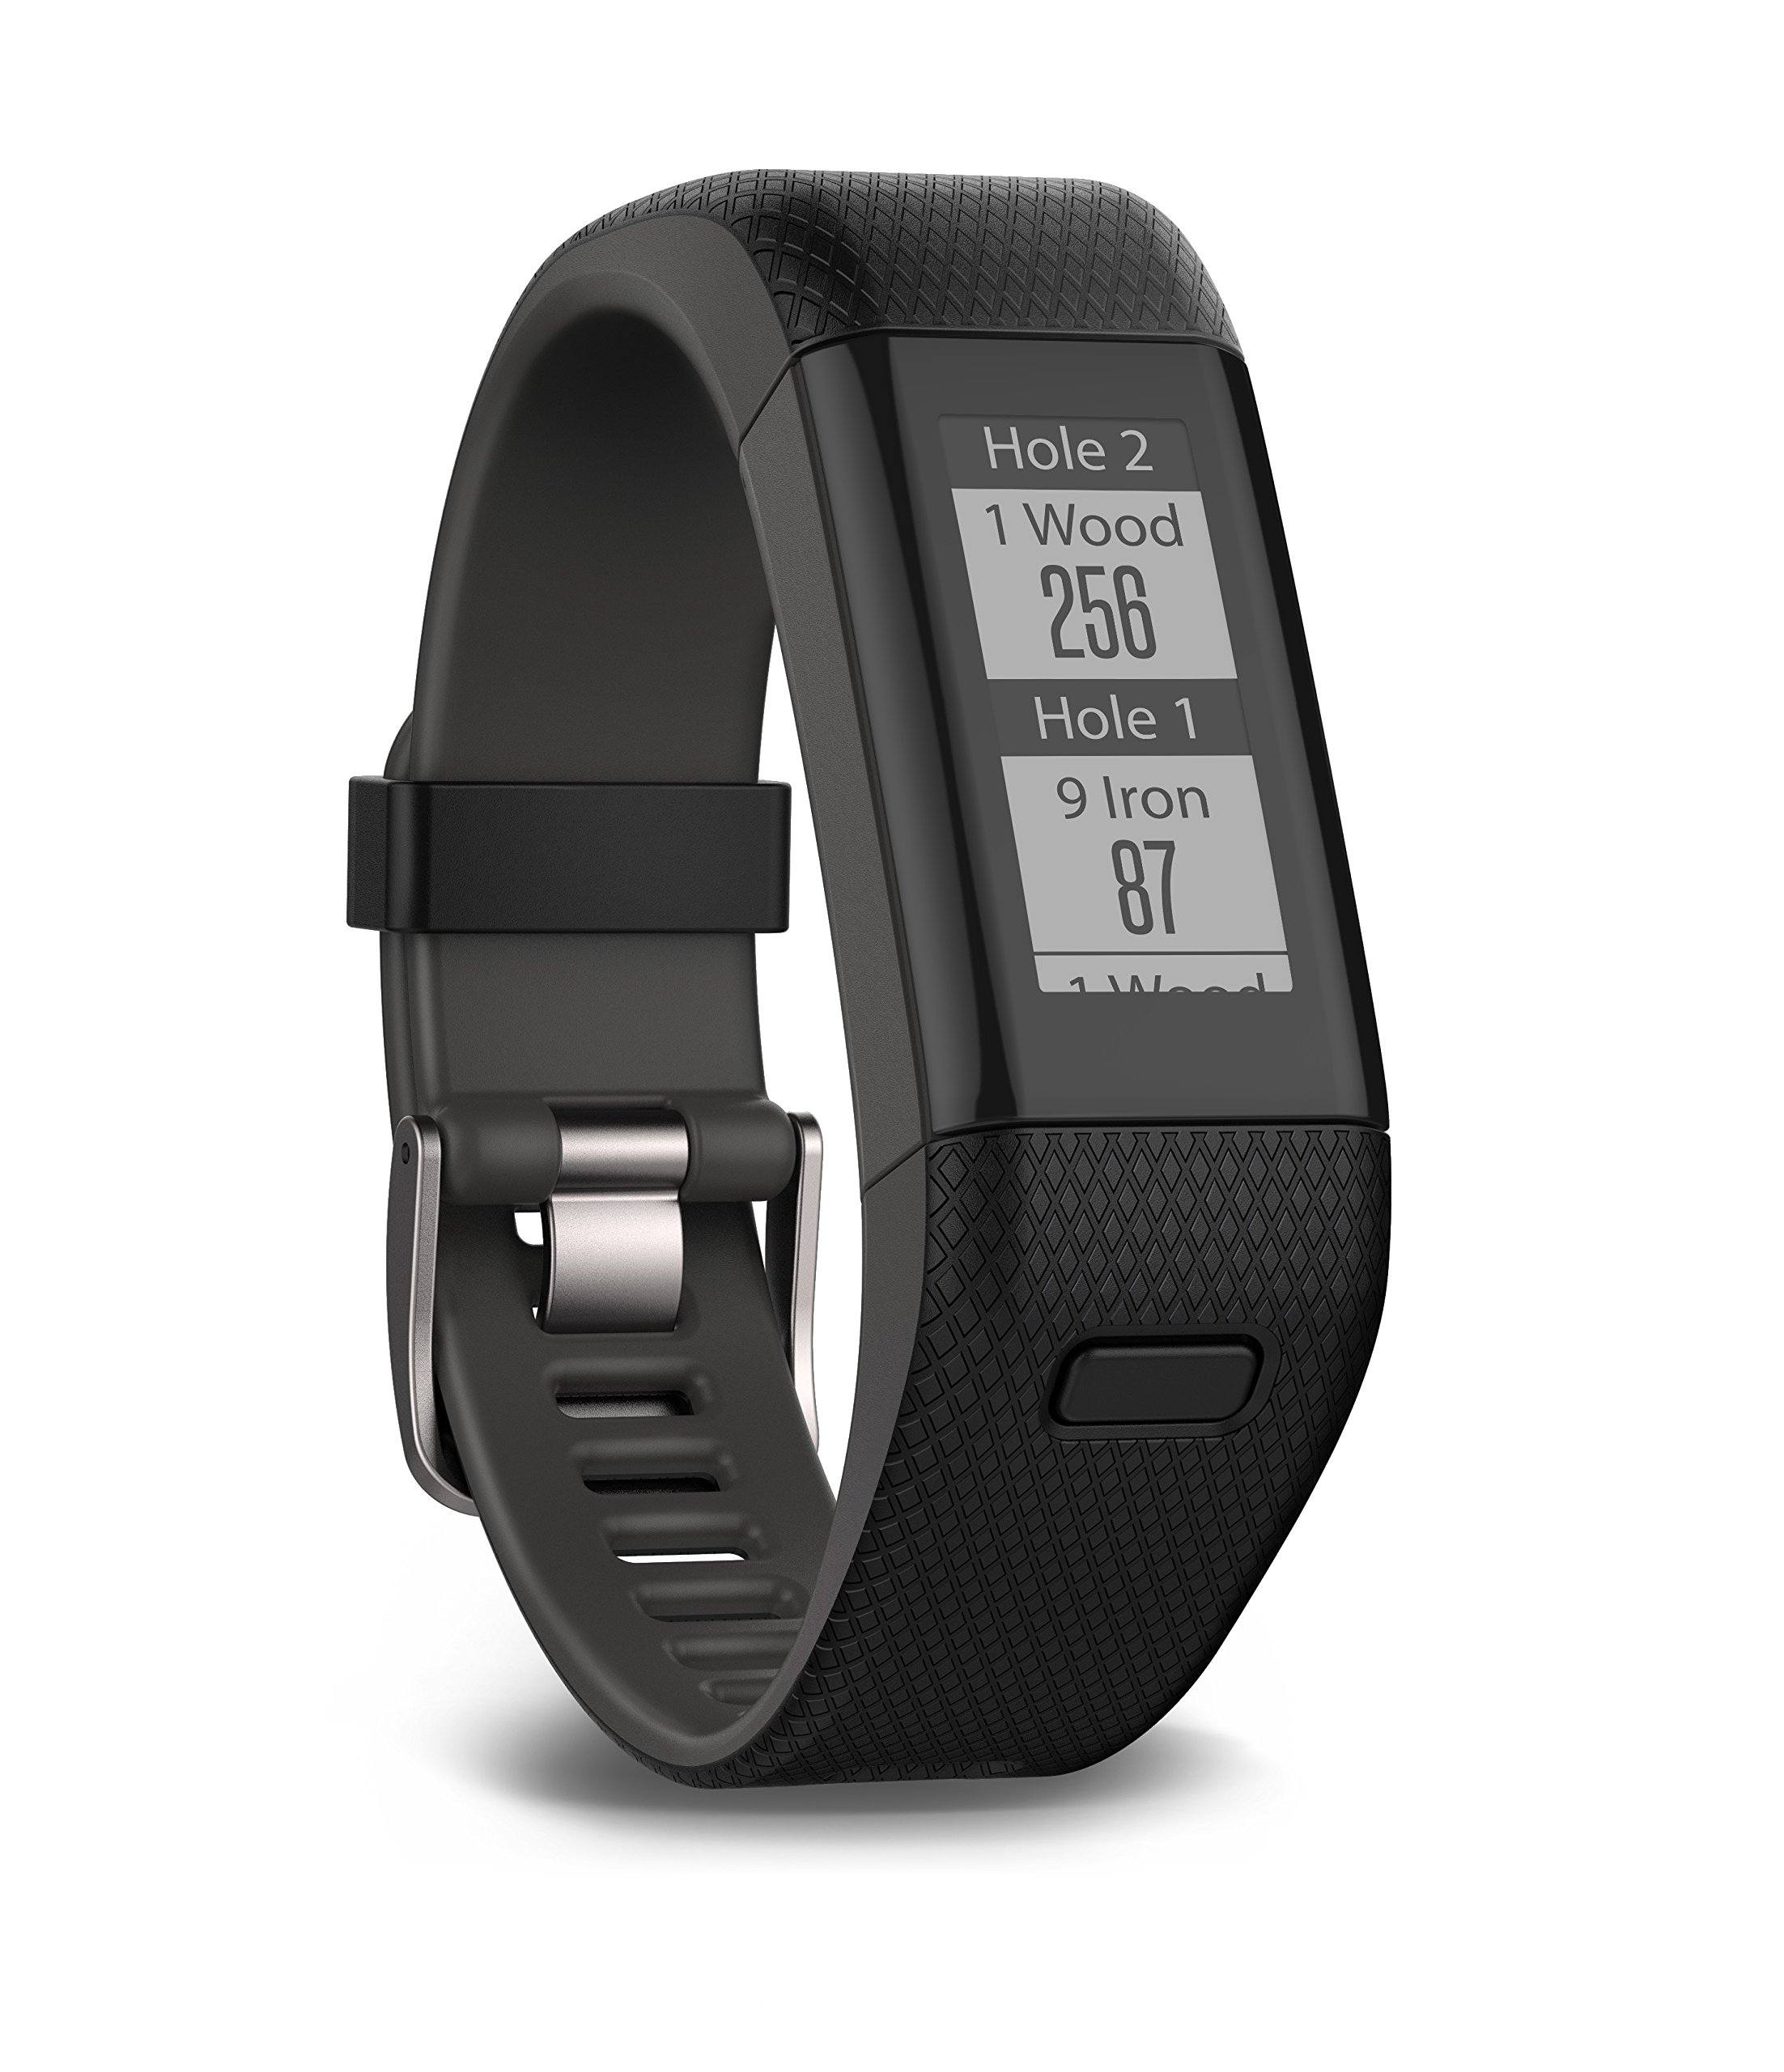 Garmin Approach X40 GPS Golf Band - Black/Gray